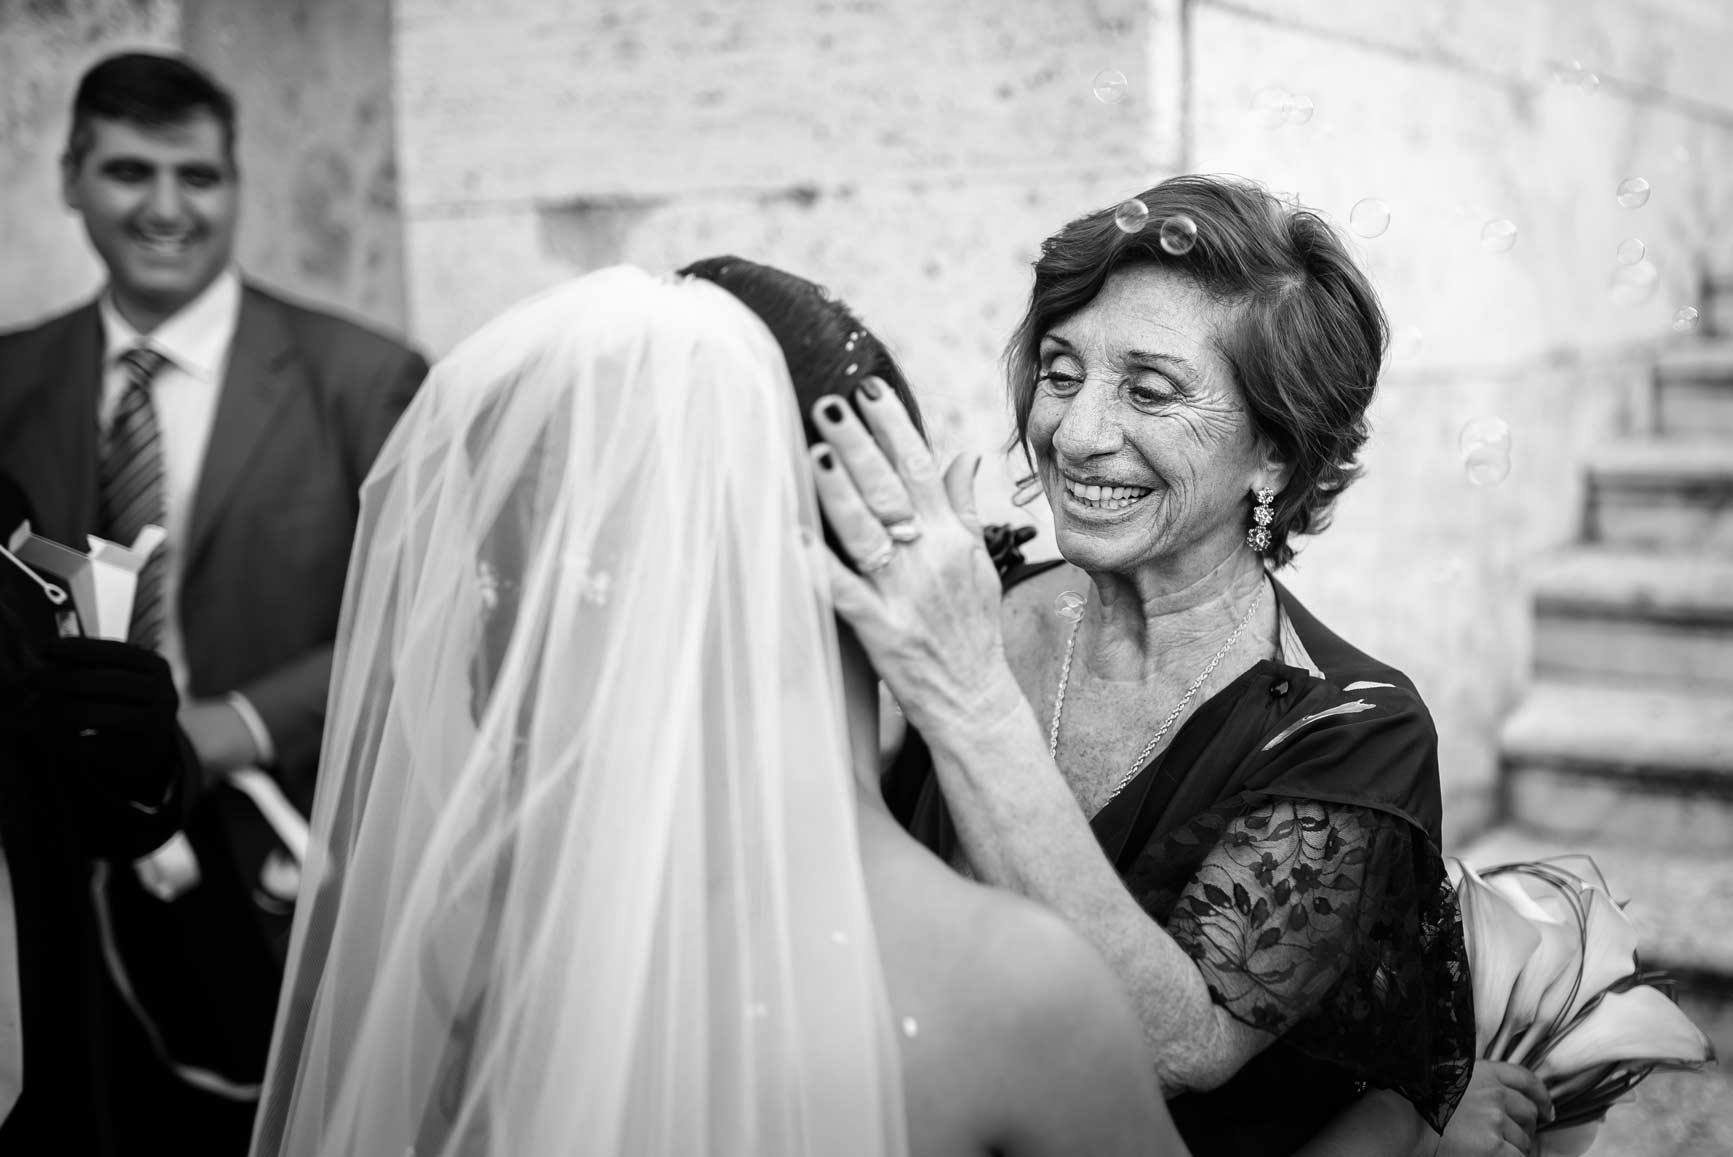 Reportage-Wedding-Photographer-in-Italy-Rome-Ceremony